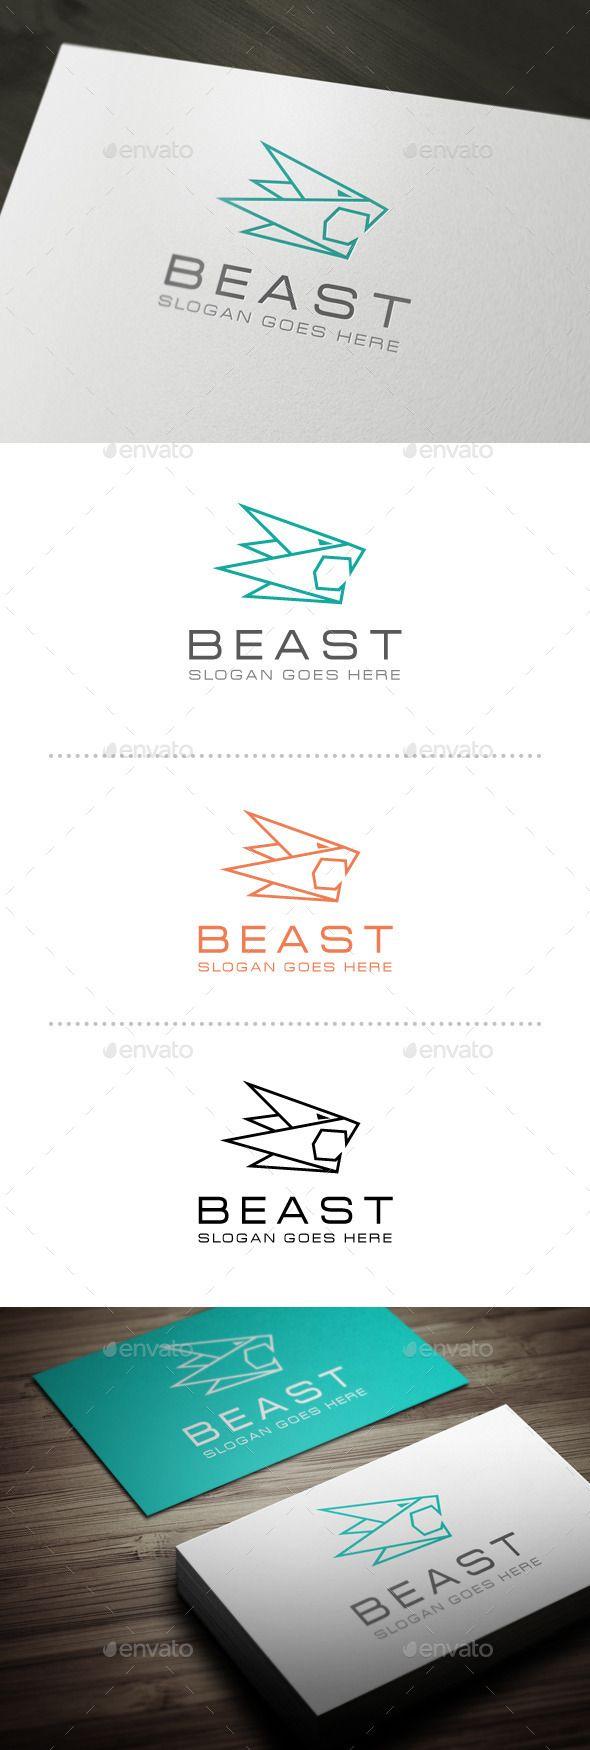 Beast  Logo Design Template Vector #logotype Download it here: http://graphicriver.net/item/beast-logo-template/10664062?s_rank=1065?ref=nexion